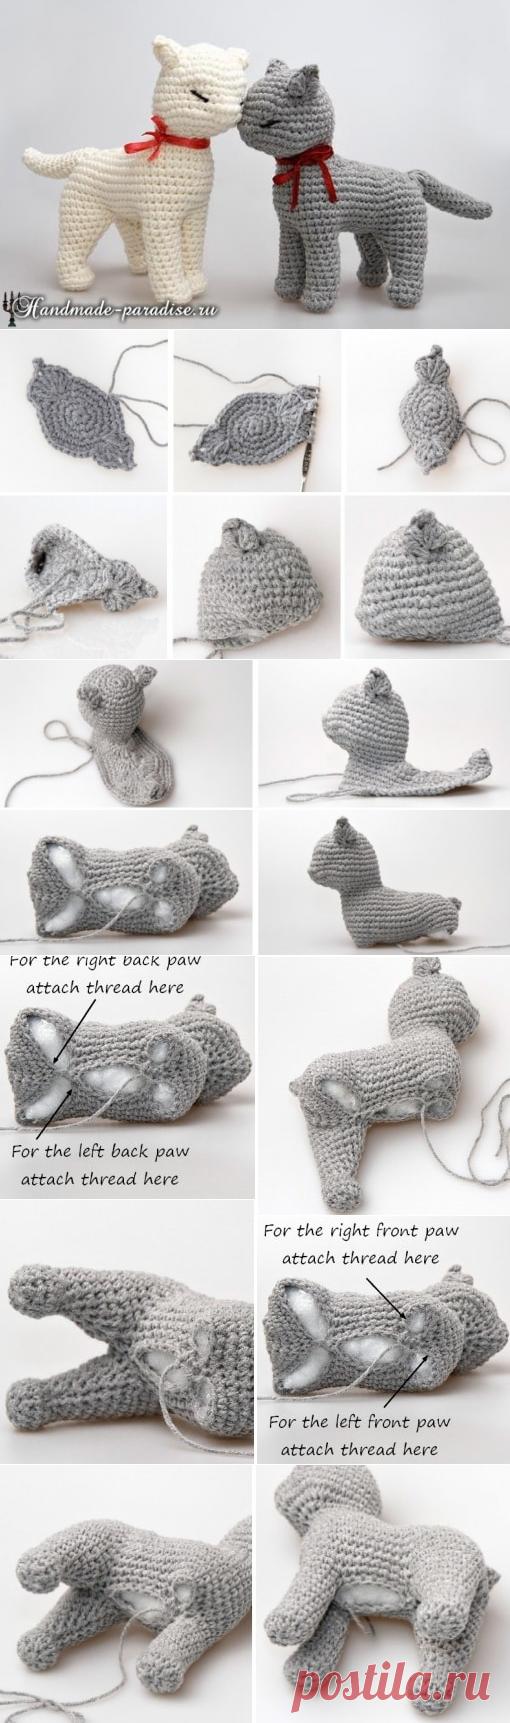 Cat of an amiguruma. Description of knitting by a hook